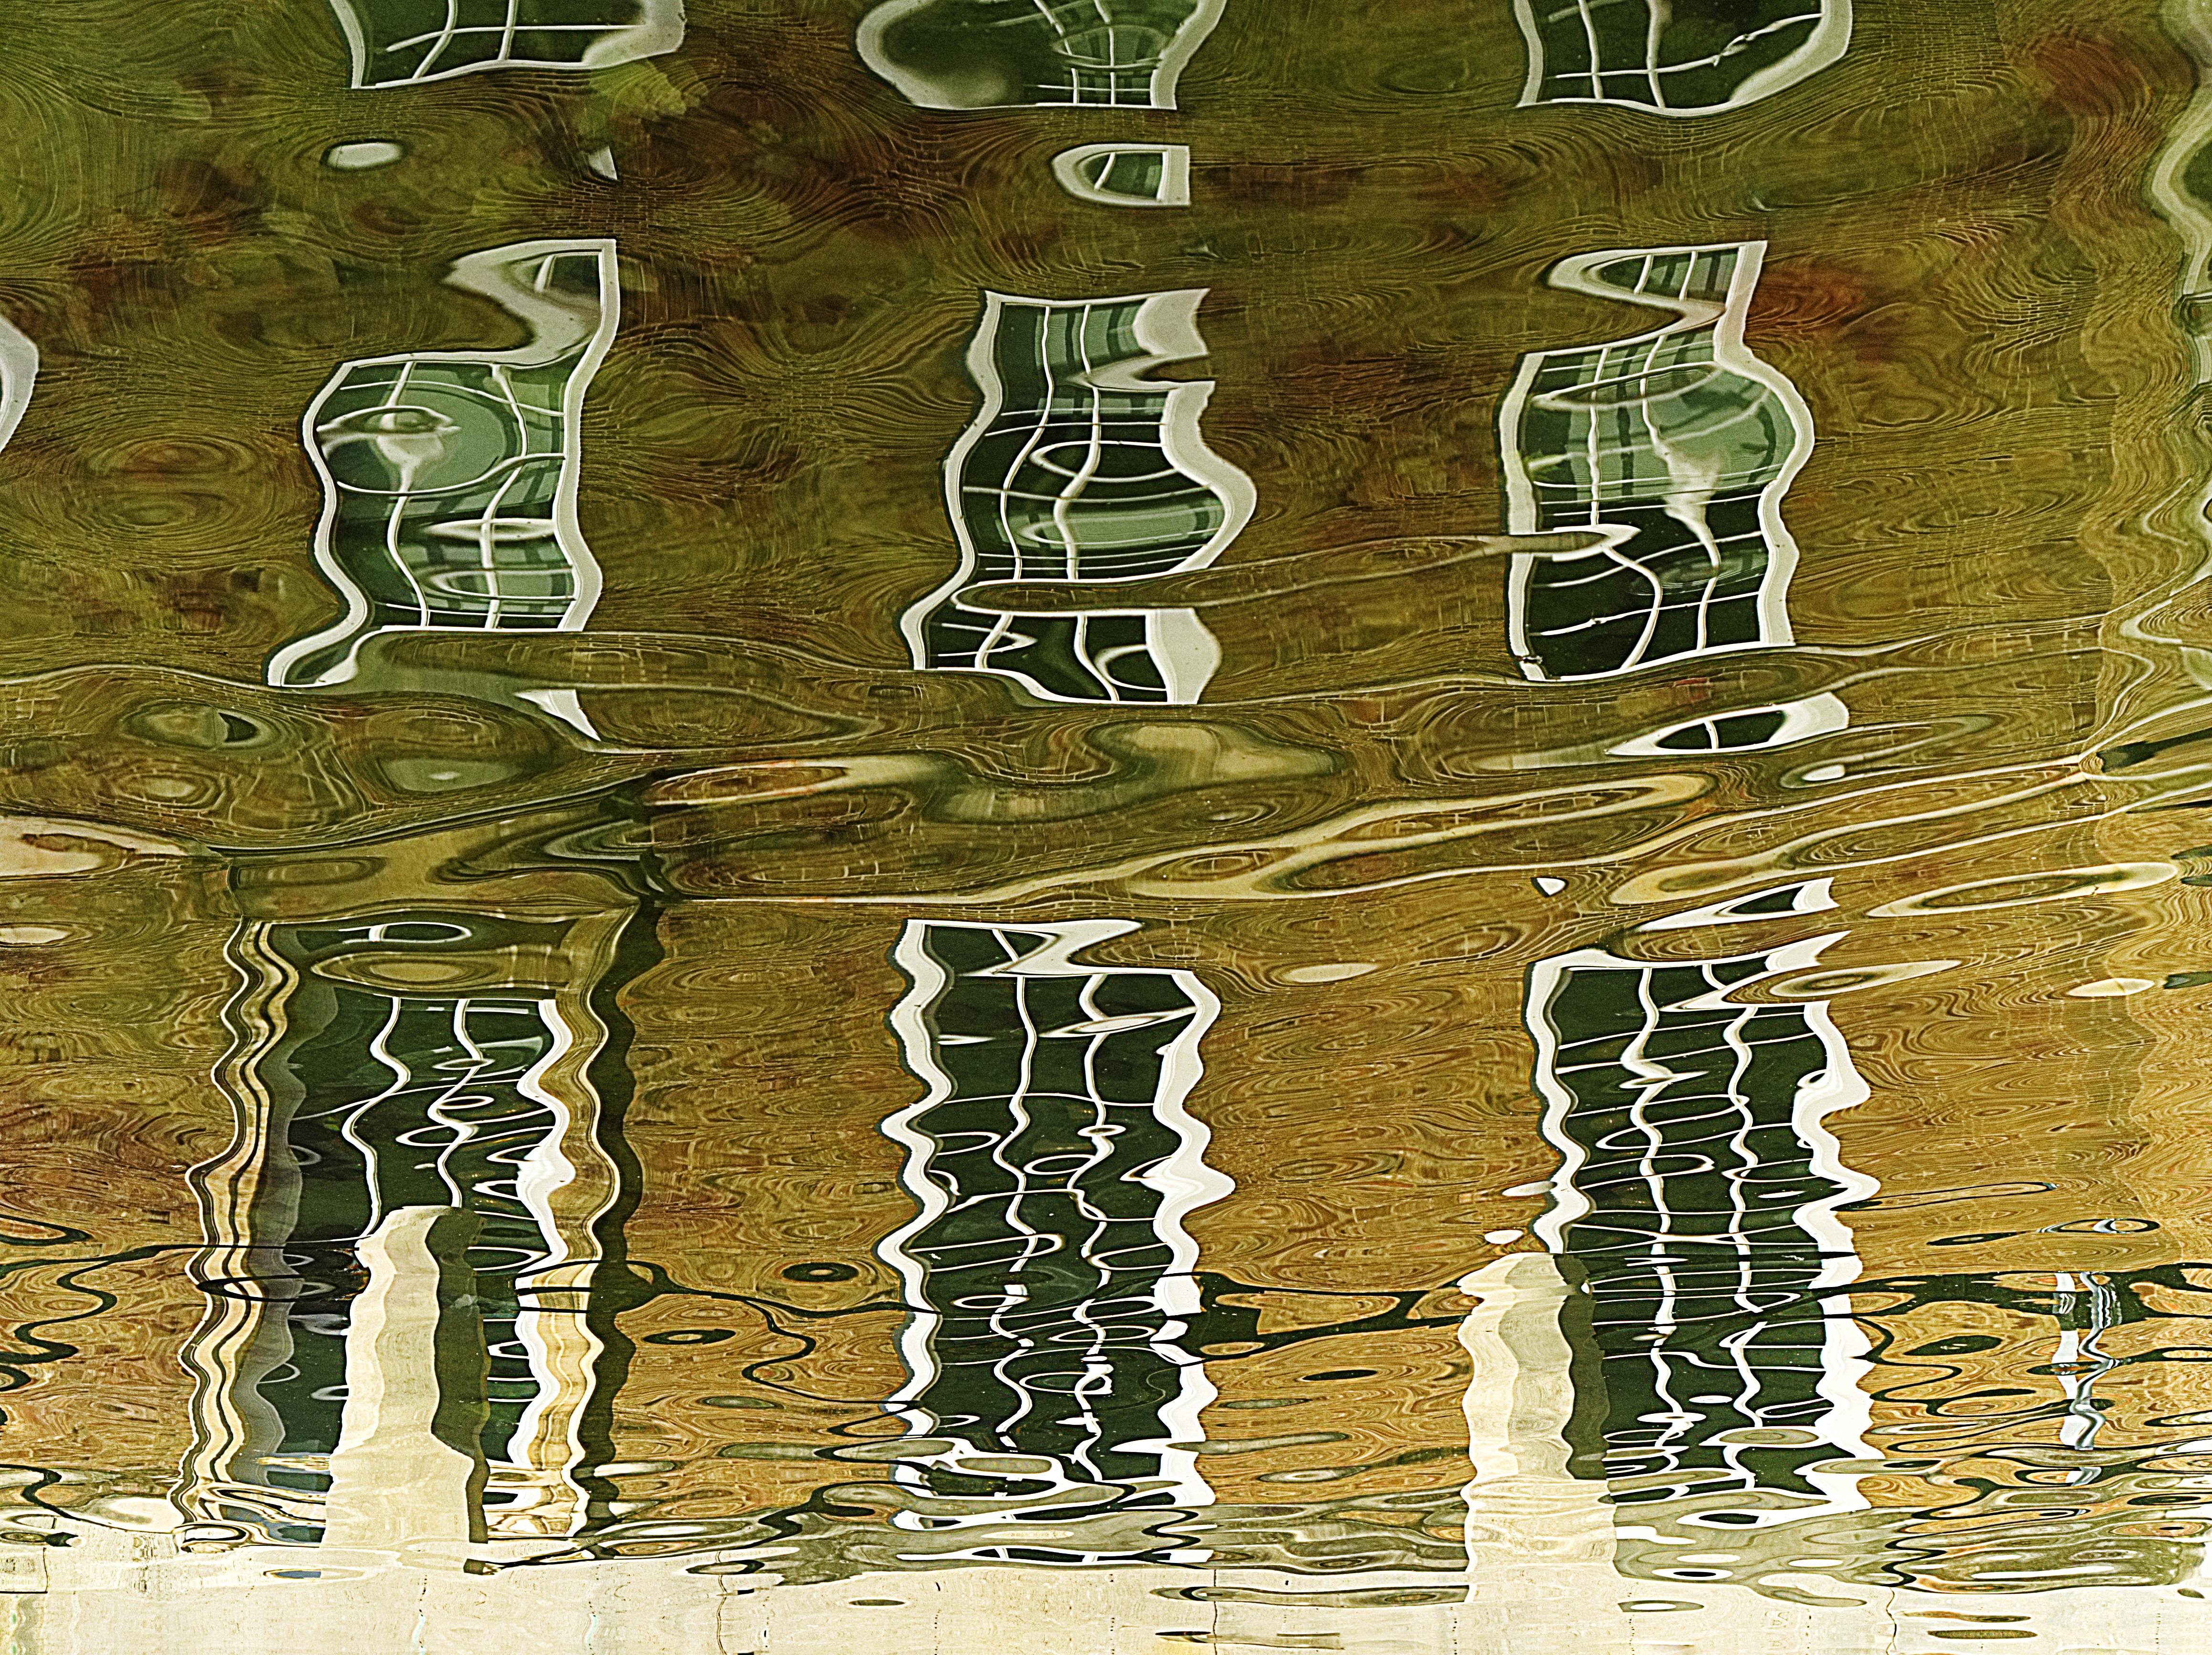 Gambar Pohon Air Cair Abstrak Arsitektur Jendela Danau